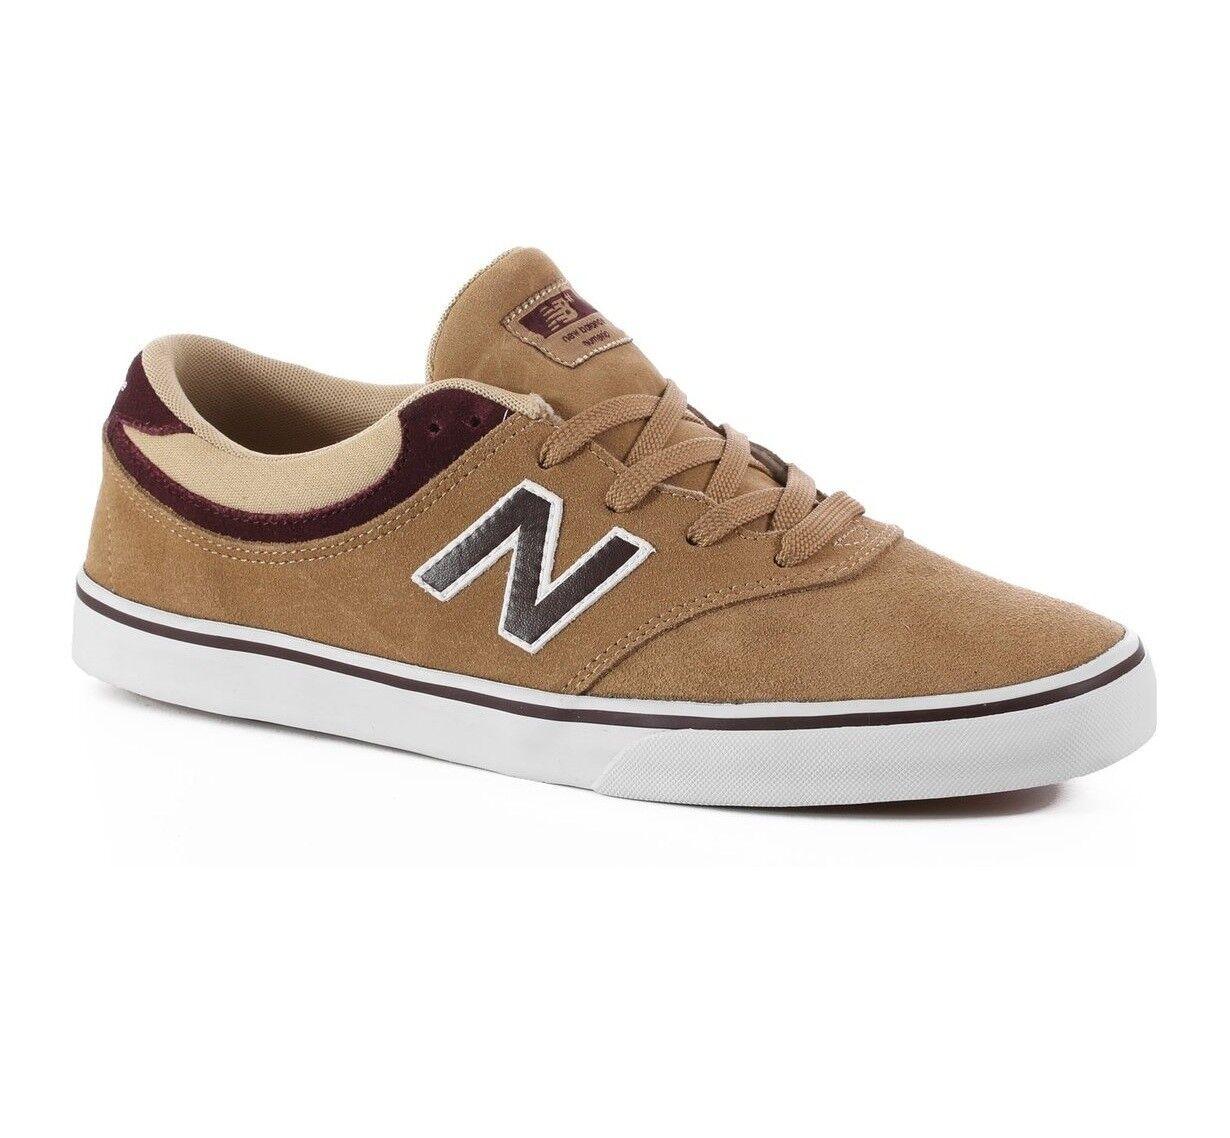 New Balance 254 Numeric NM254TNW Khaki Marron Skate Chaussures Homme